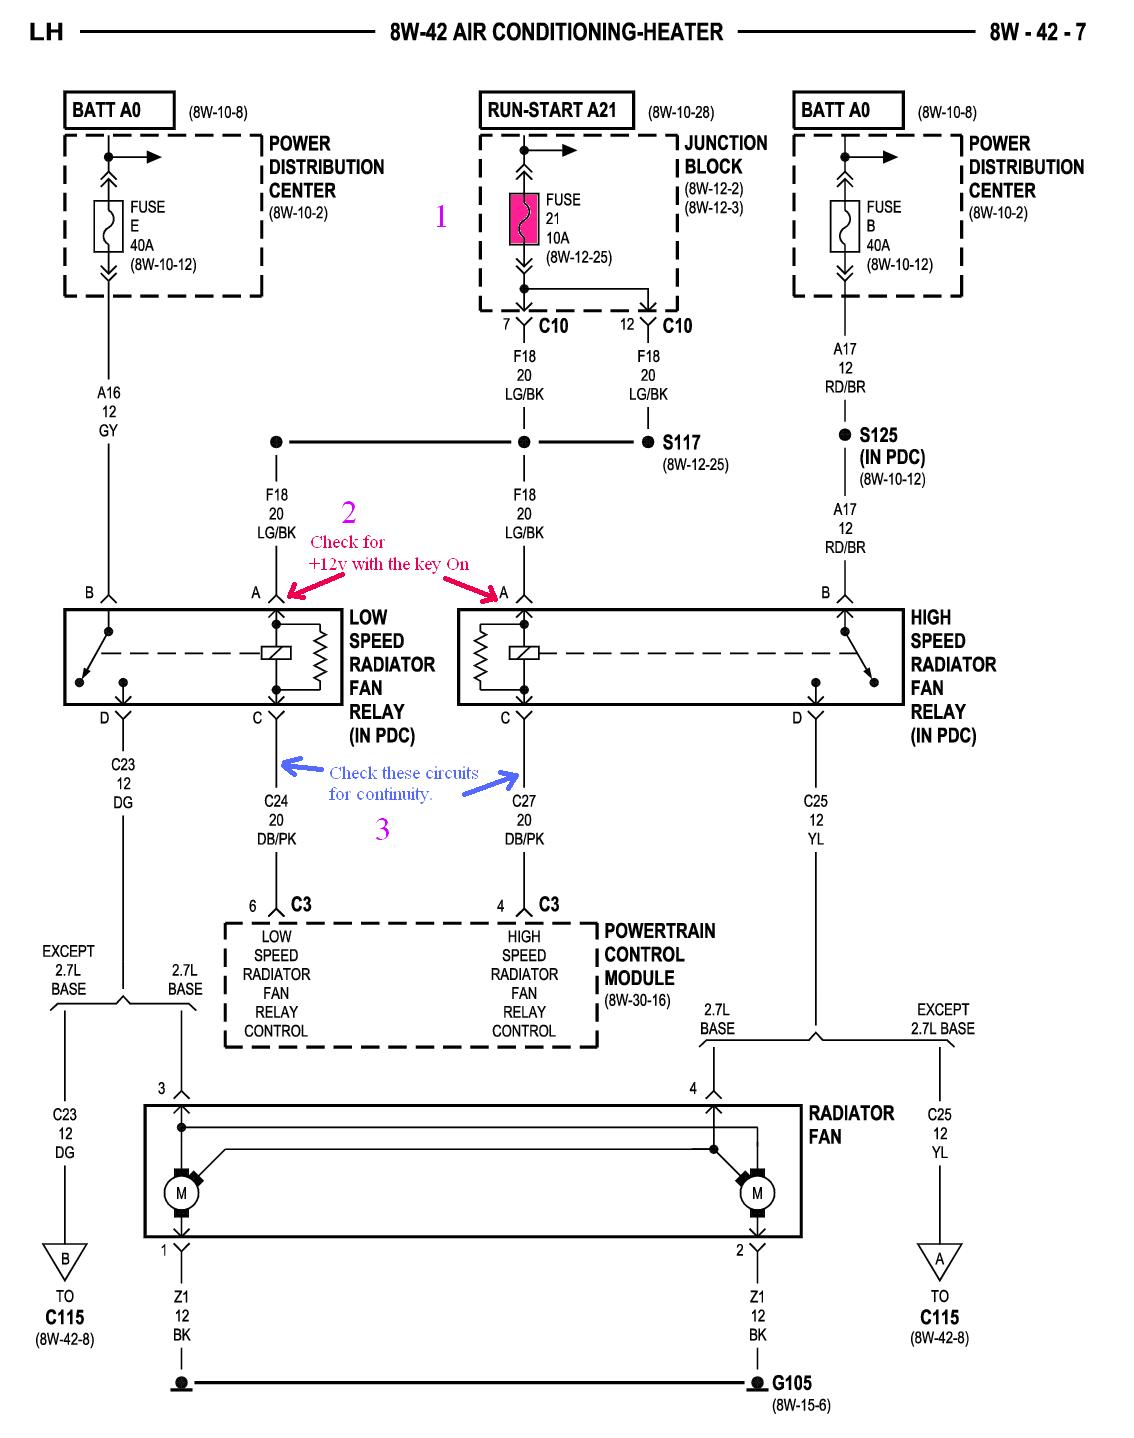 2003 Chrysler Concorde Wiring Diagram - Wiring Diagram Recent fall-desk -  fall-desk.cosavedereanapoli.it   2000 Chrysler Concorde Car Stereo Wiring Diagram      fall-desk.cosavedereanapoli.it